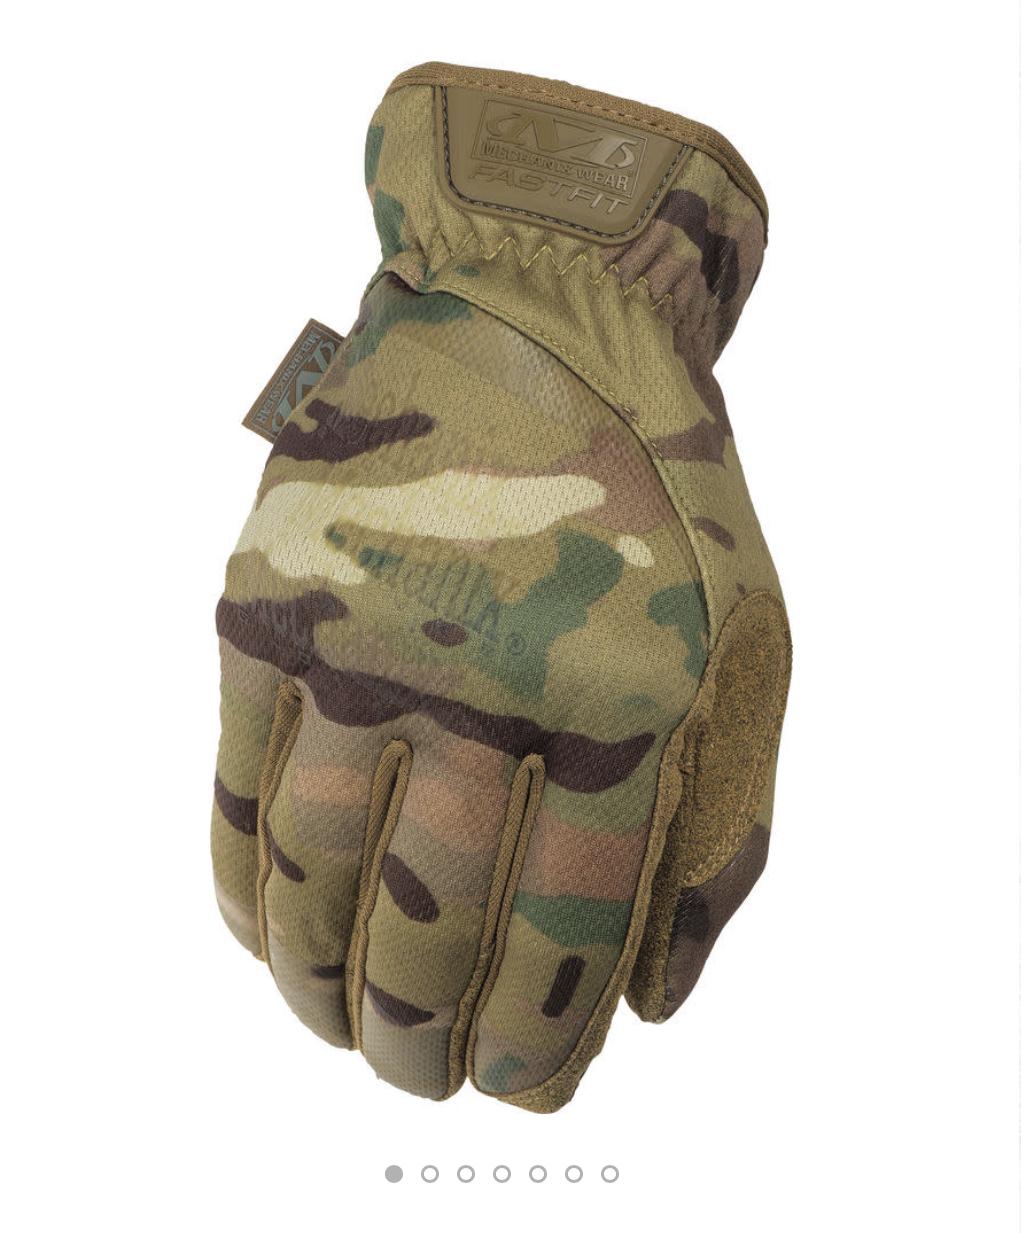 Mechanix Wear MultiCam Fast Fit Tactical Gloves (Large & X-Large) + Free Mechanix Wear MultiCam Face Mask for $11.24